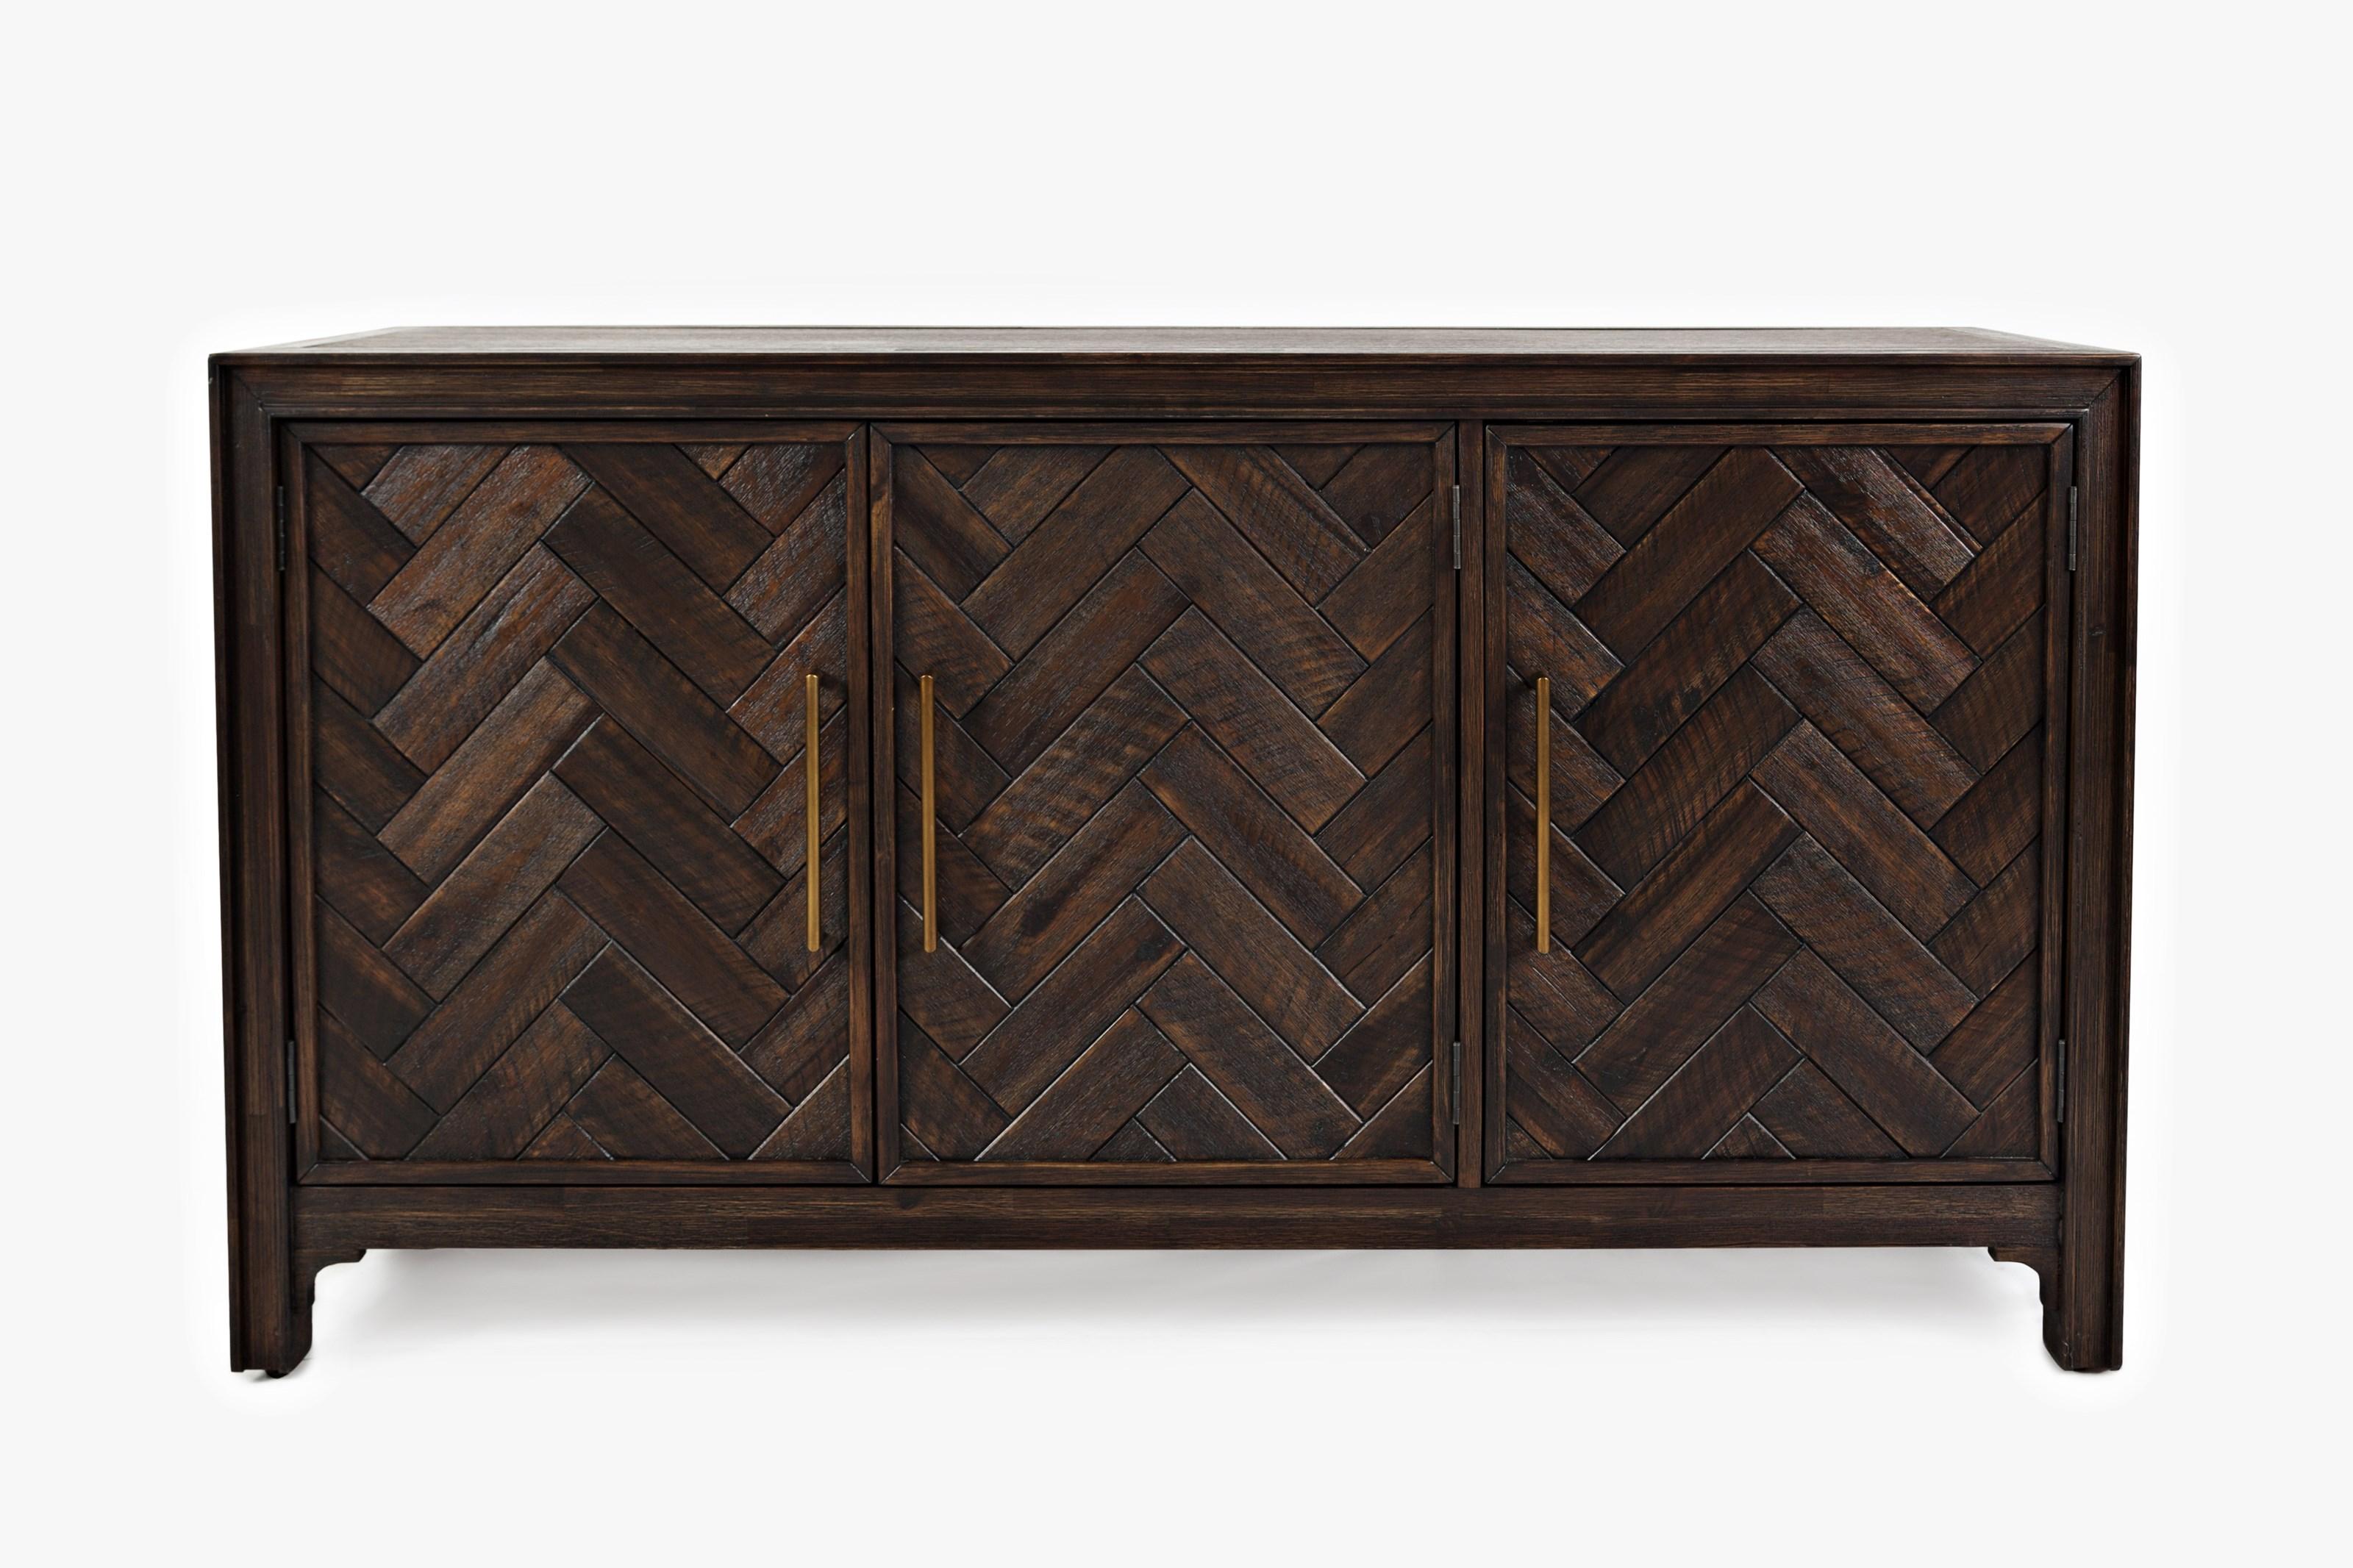 Gramercy 3 Door Accent Cabinet by Jofran at Bullard Furniture